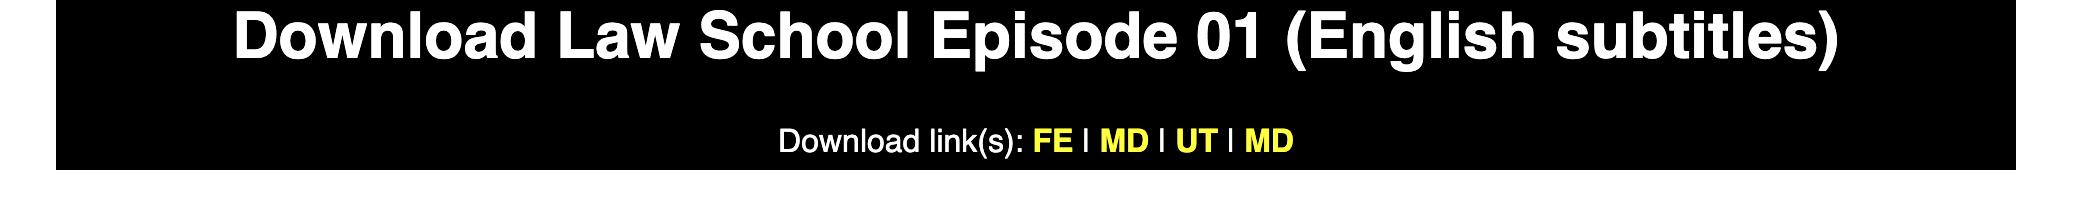 Download Law School Episode 01 (English subtitles)